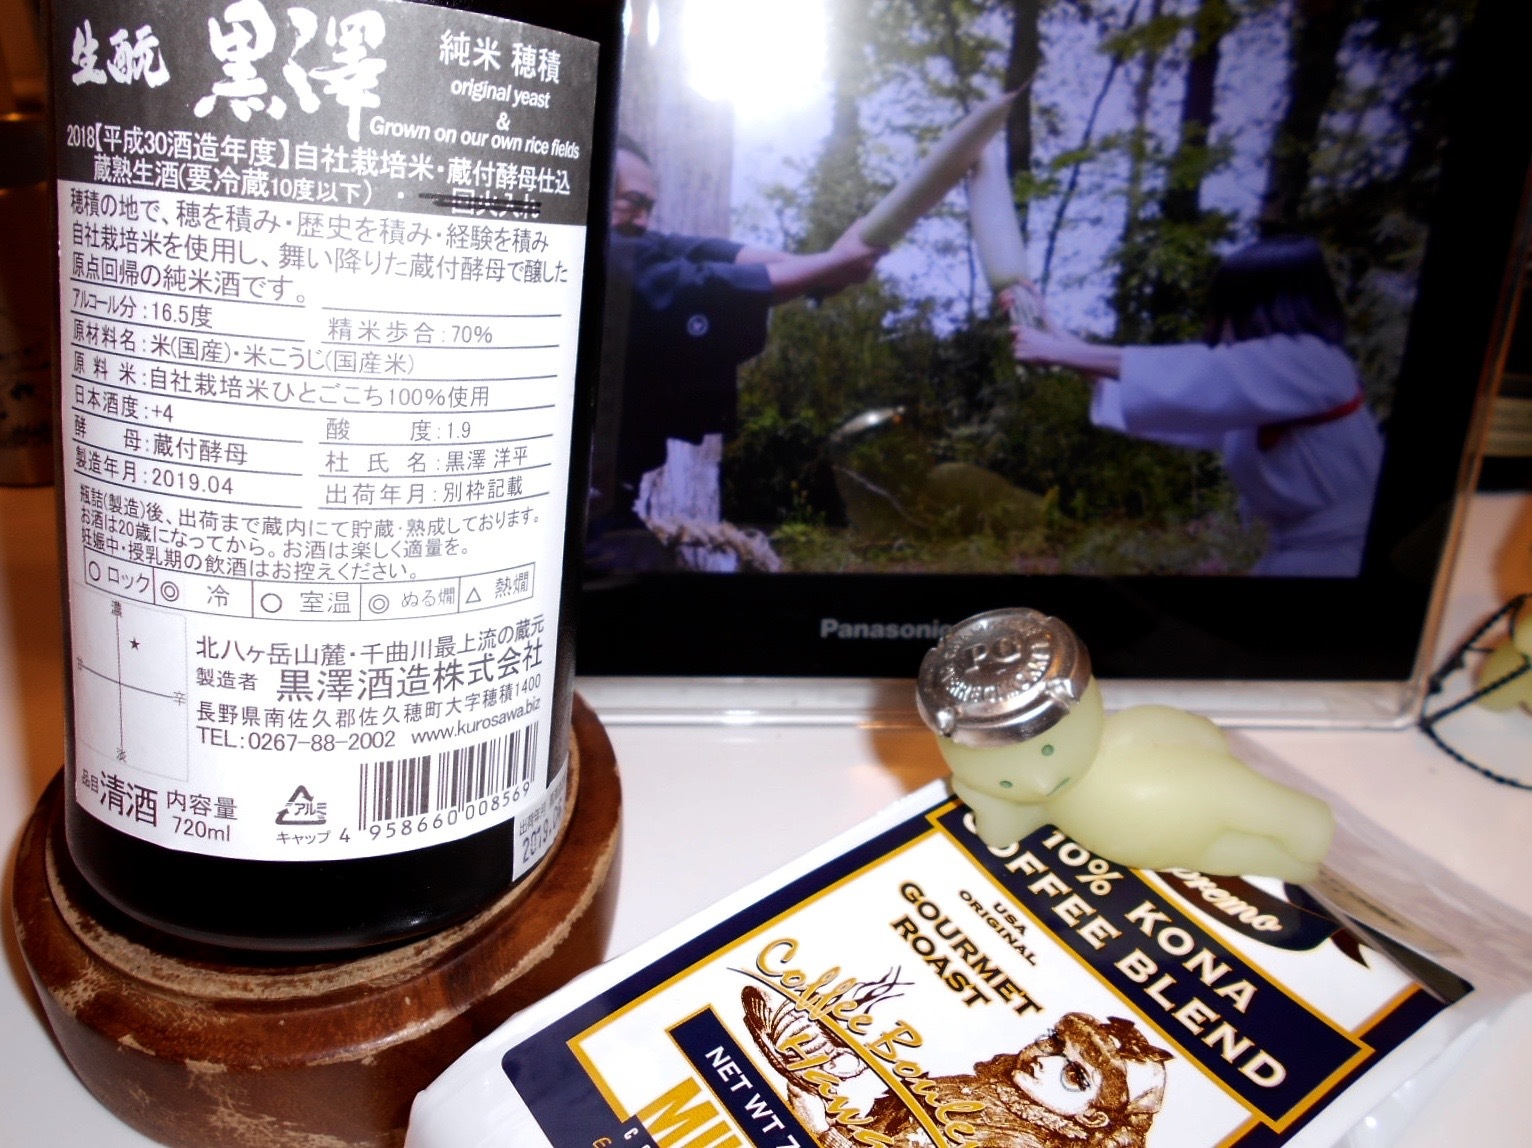 kurosawa_hozumi30by1_2.jpg